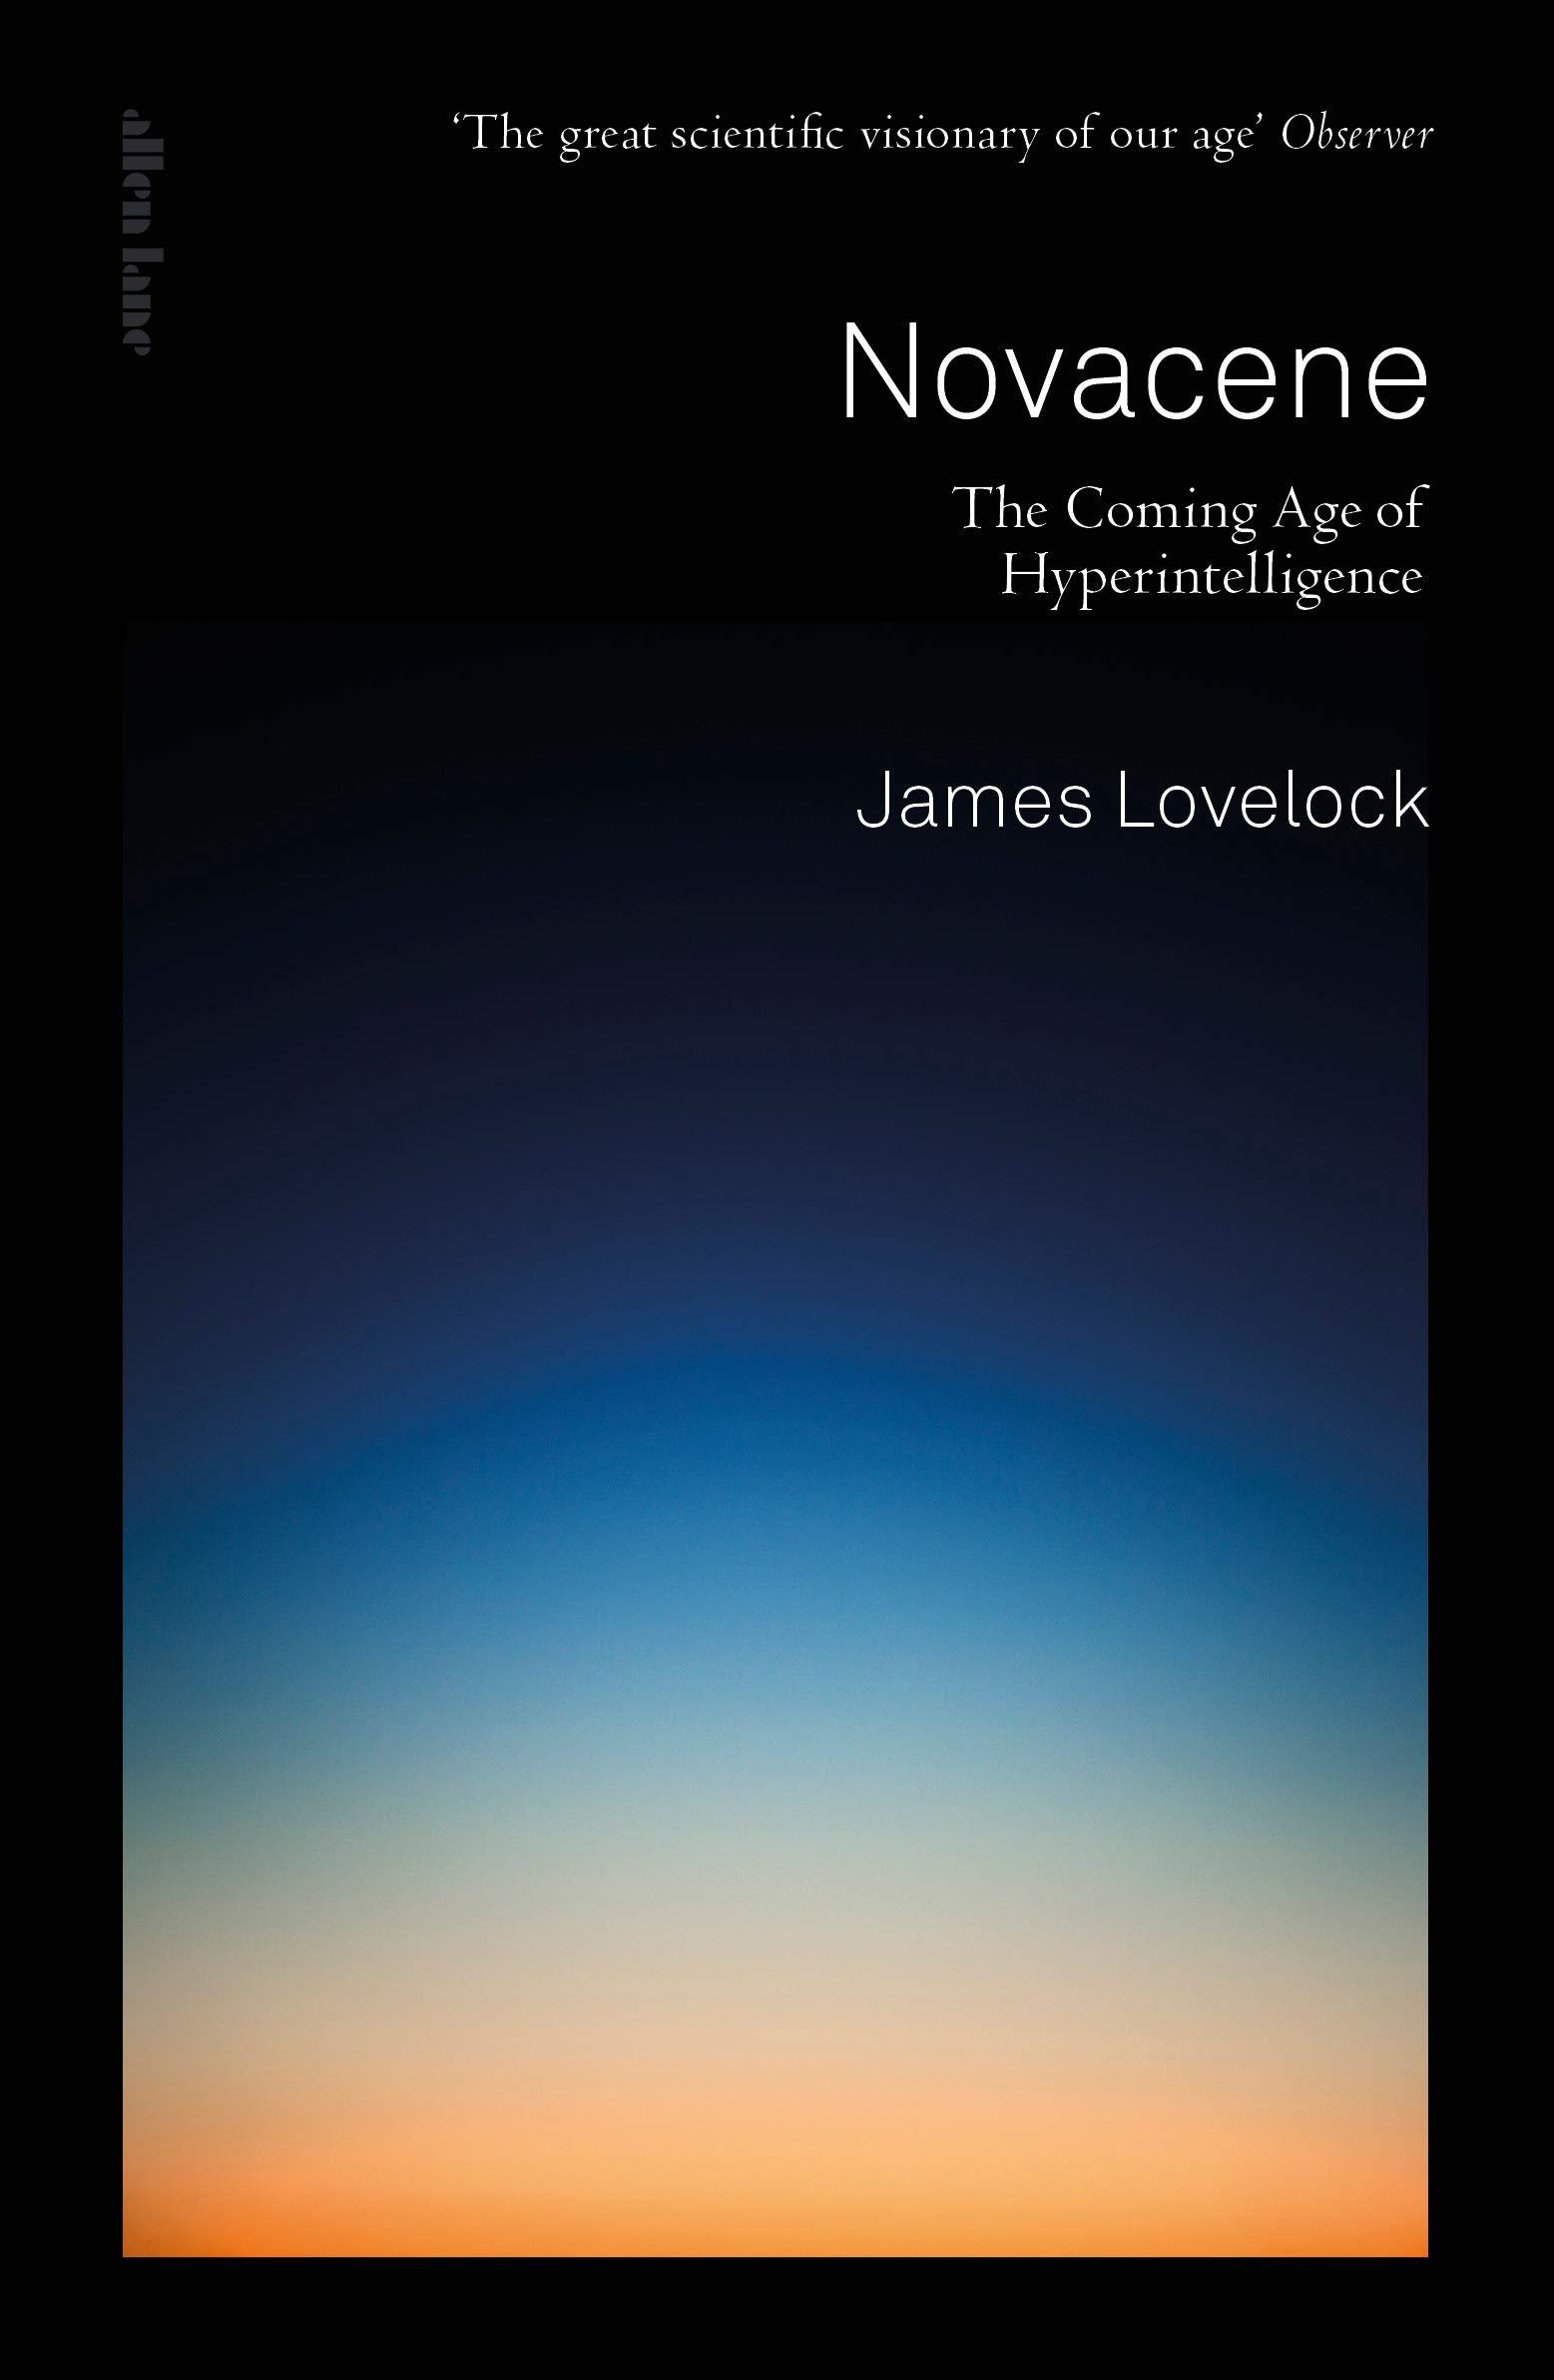 James Lovelock, The Coming Age of Hyperintelligence, Penguin Book UK, 2019